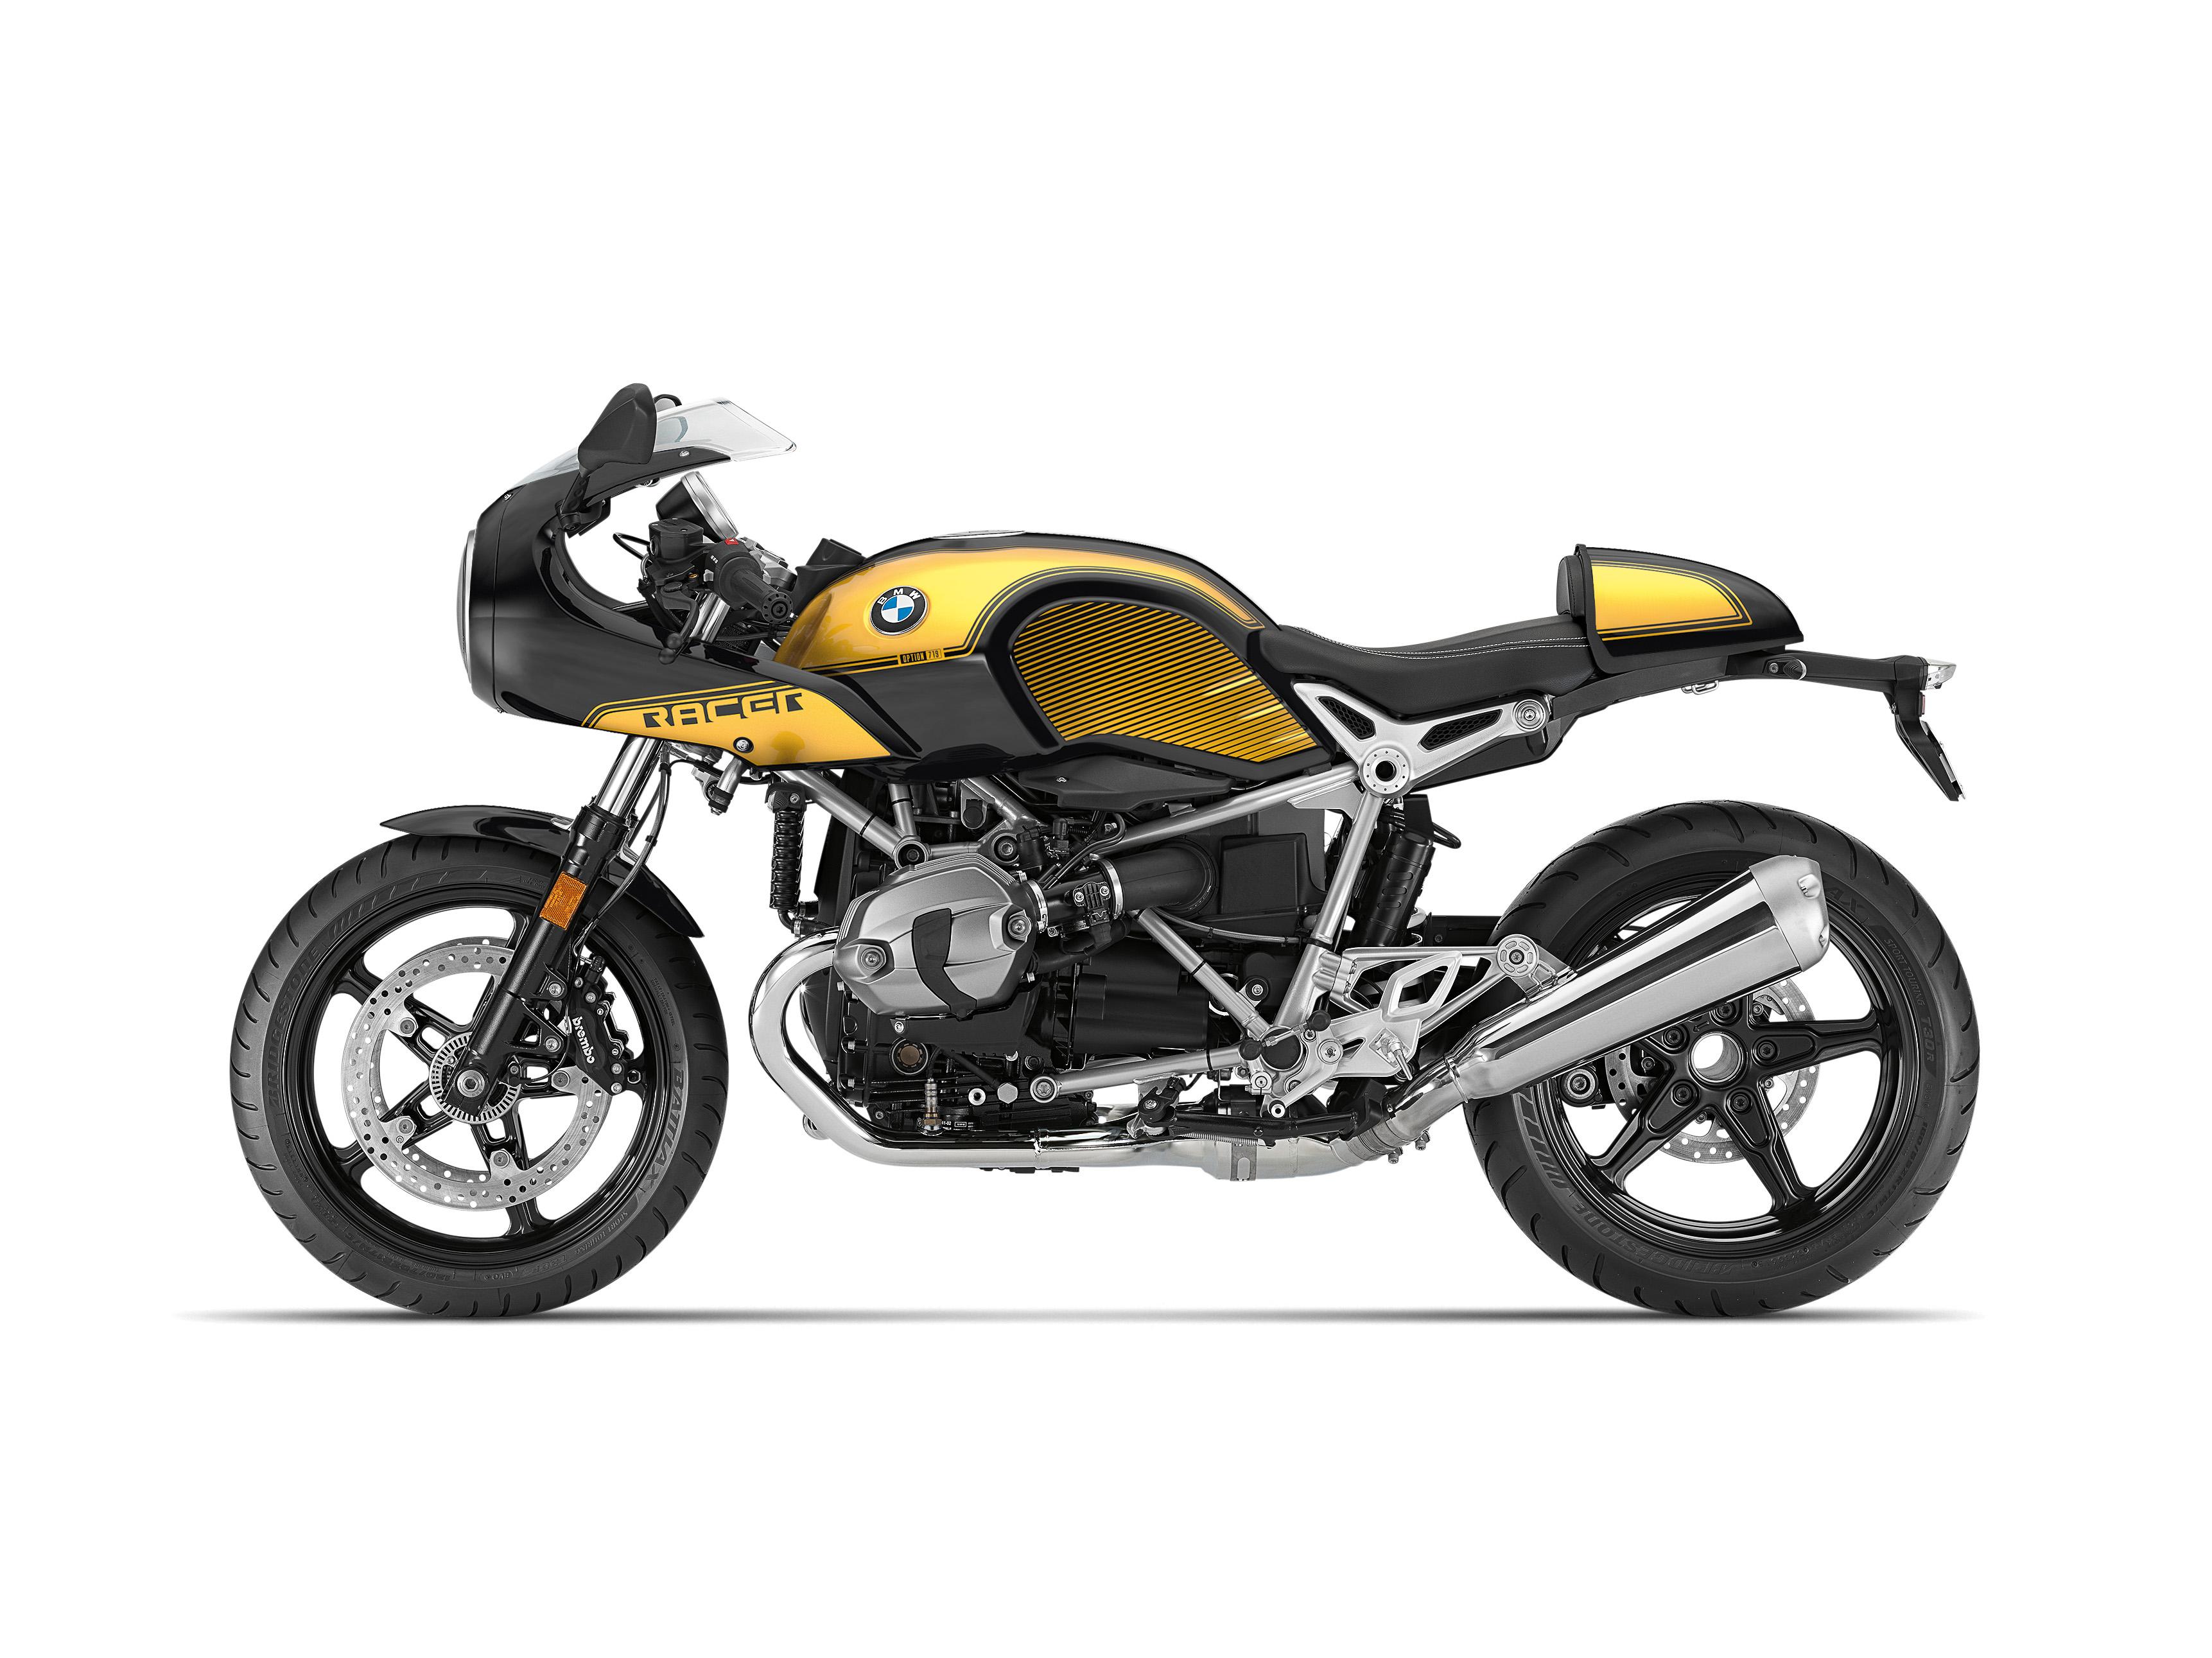 BMW R nine T Racer 1200 ABS 2021, Philippines Price, Specs ...